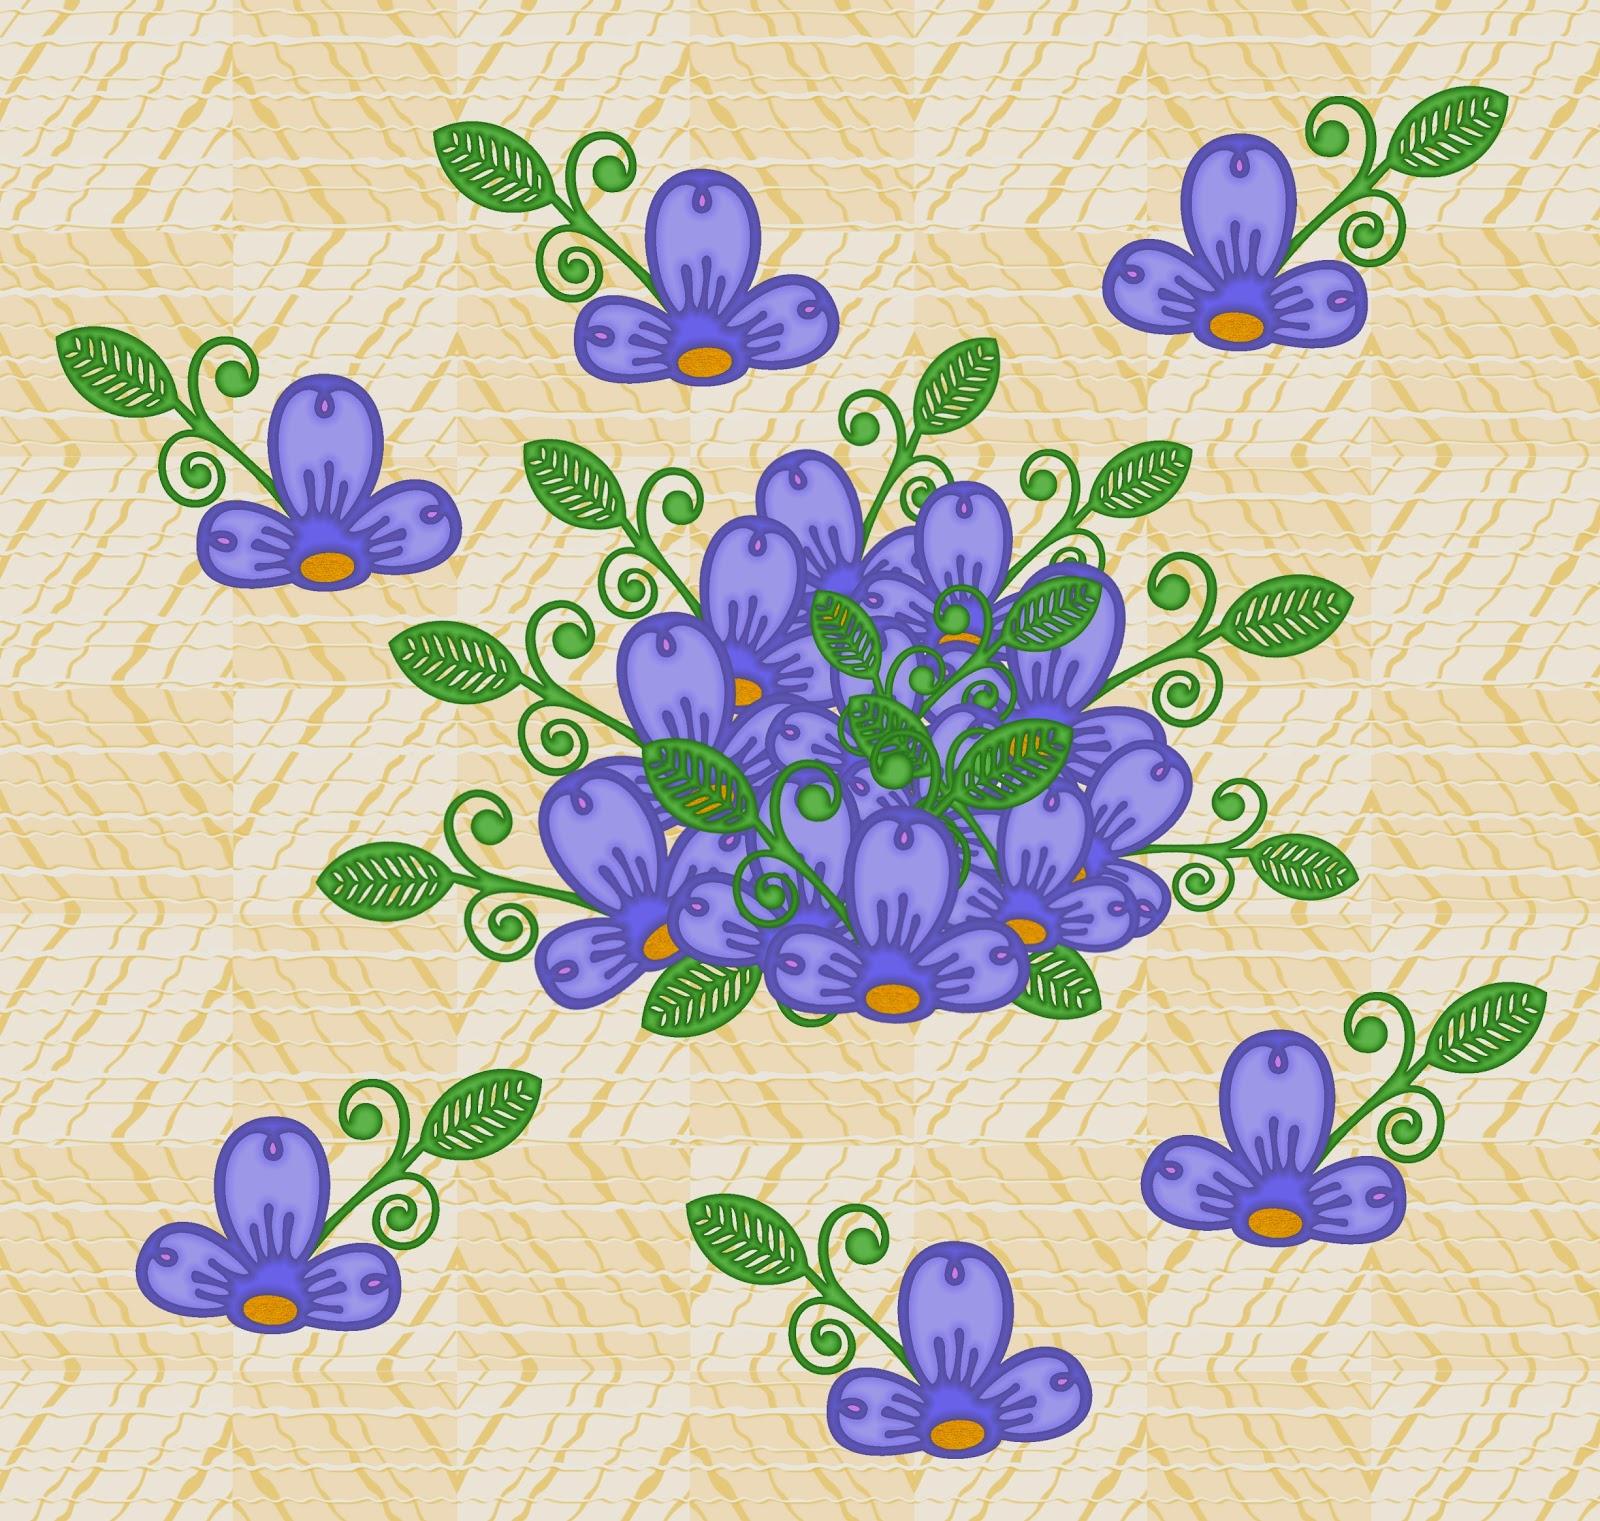 Clipart Blume 6